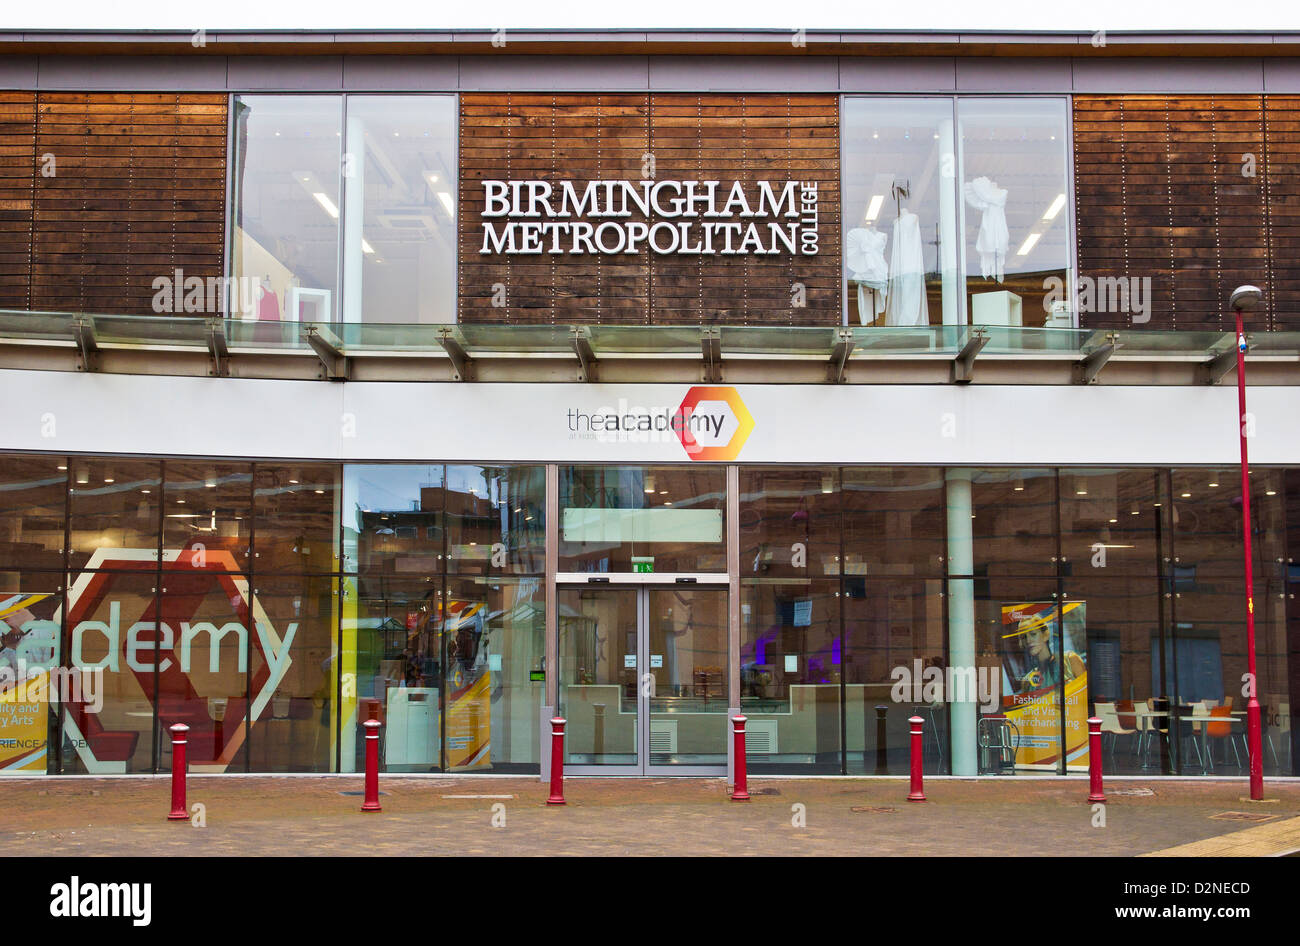 The Academy at Kidderminster Birmingham Metropolitan College - Stock Image